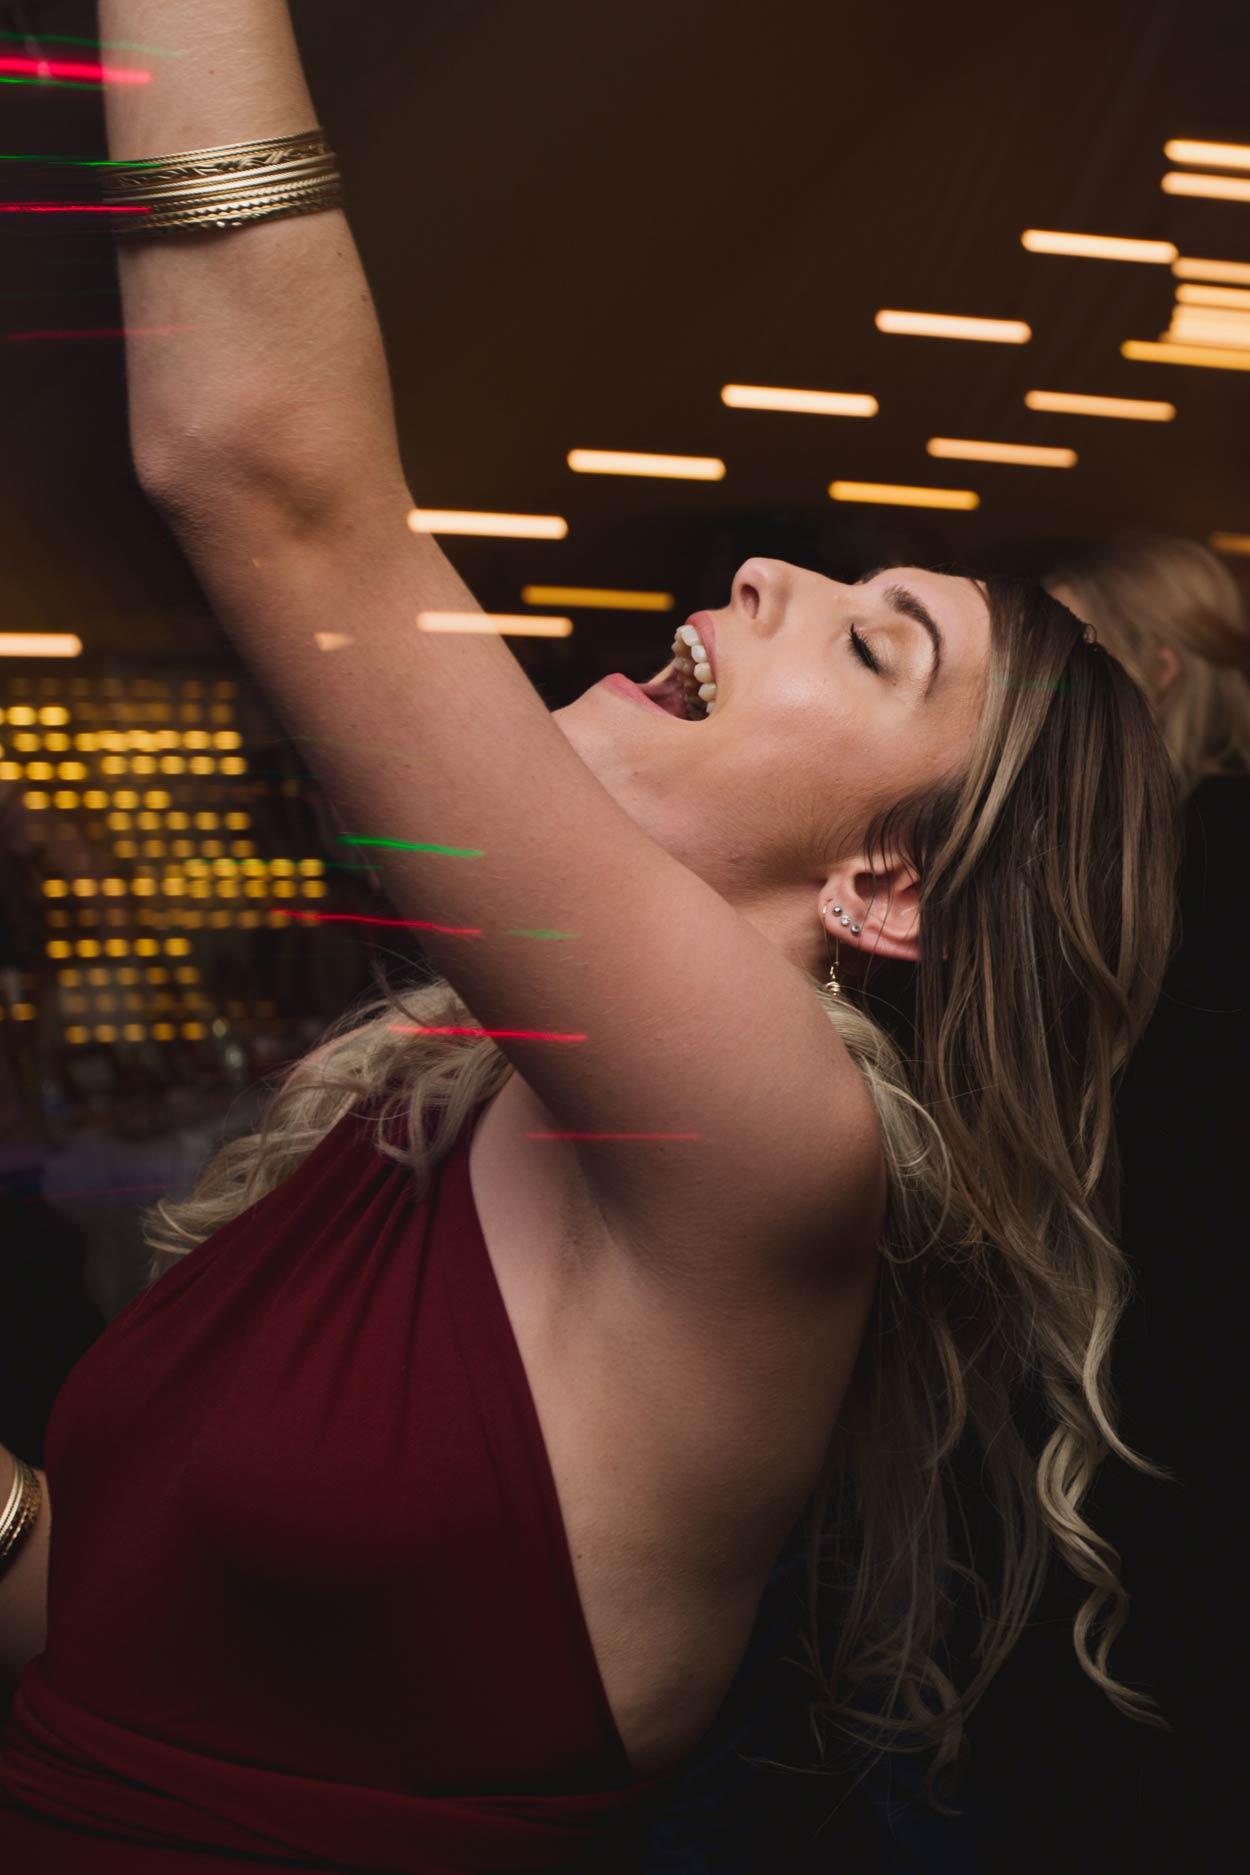 sunshine-coast-destination-wedding-photographers-brisbane-queensland-australian-maleny-montville-flaxton-noosa-hinterland-byron-bay-gold-caloundra-international-elopement-best-eco-top-blog-portrait-photos-226.jpg